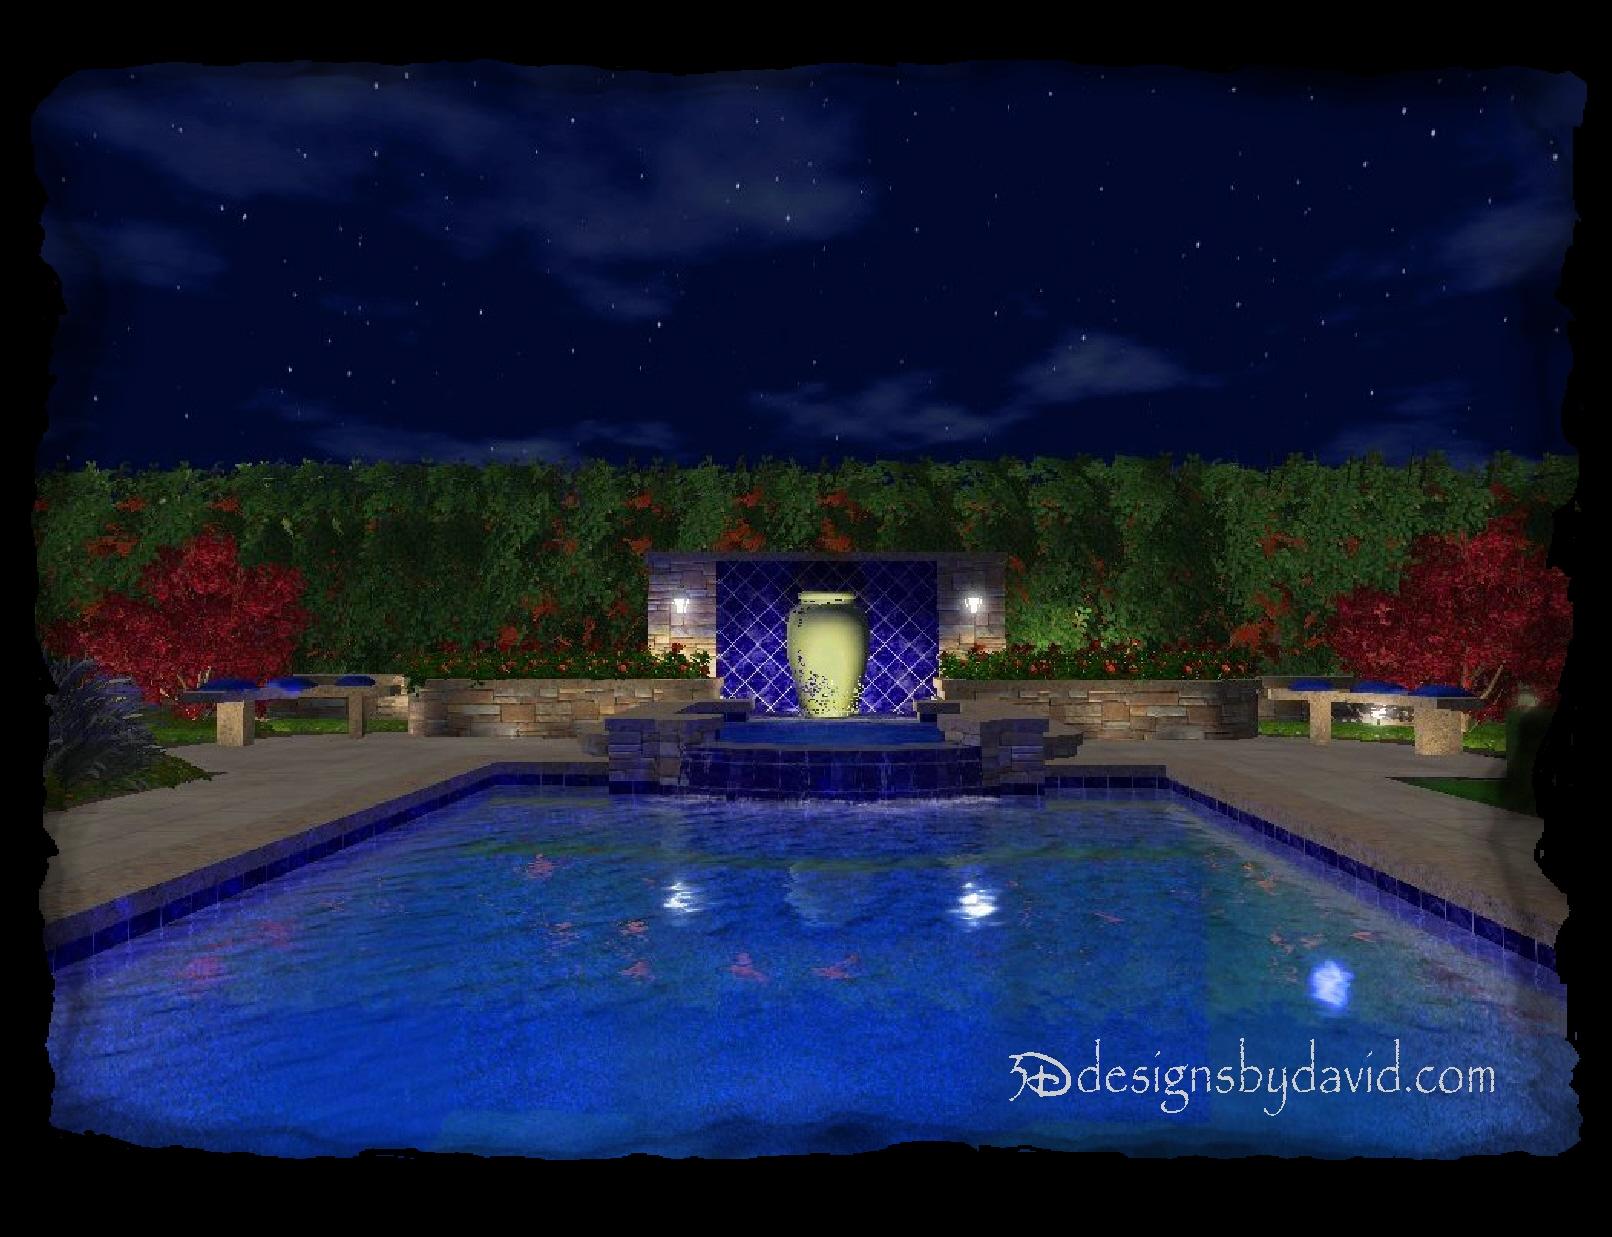 Liquid designs 3d designs by david for Virtual pool builder